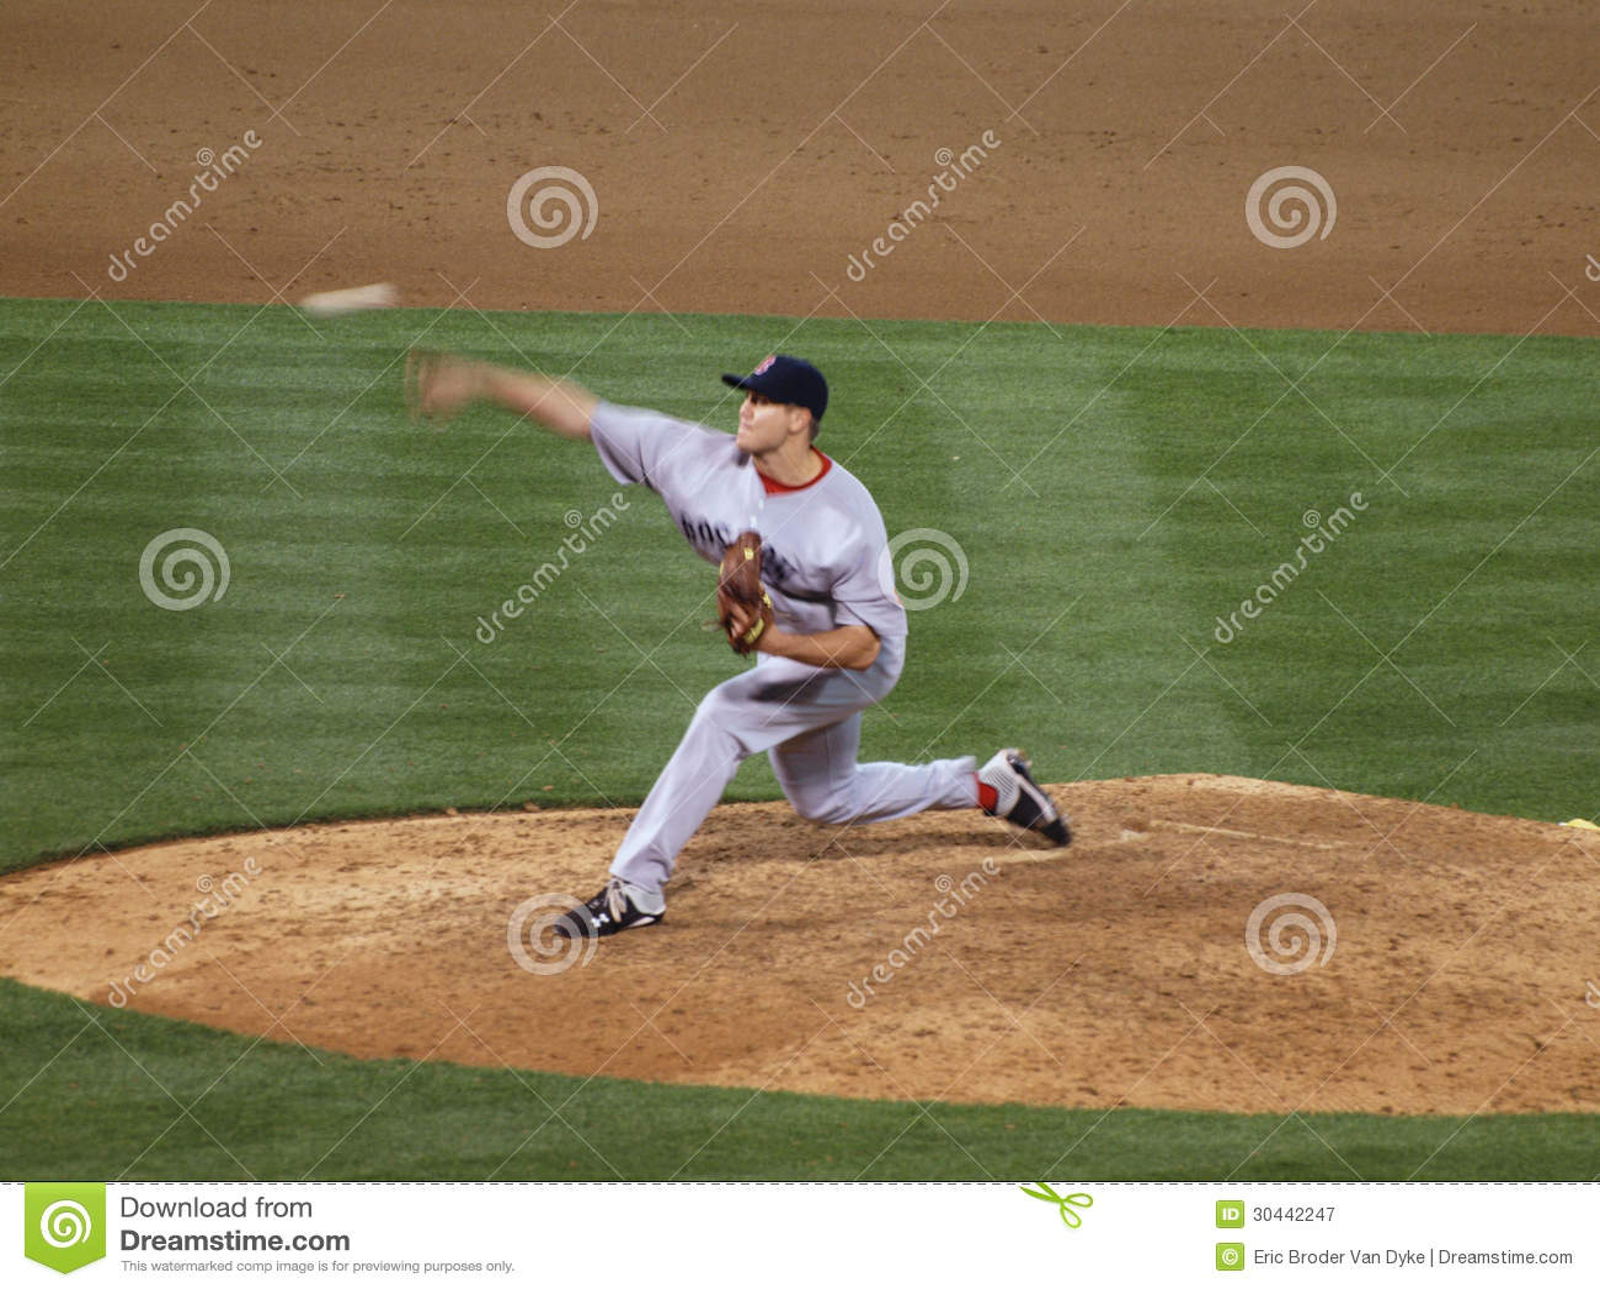 Red Sox closer Jonathan Papelbon throws a pitch ba